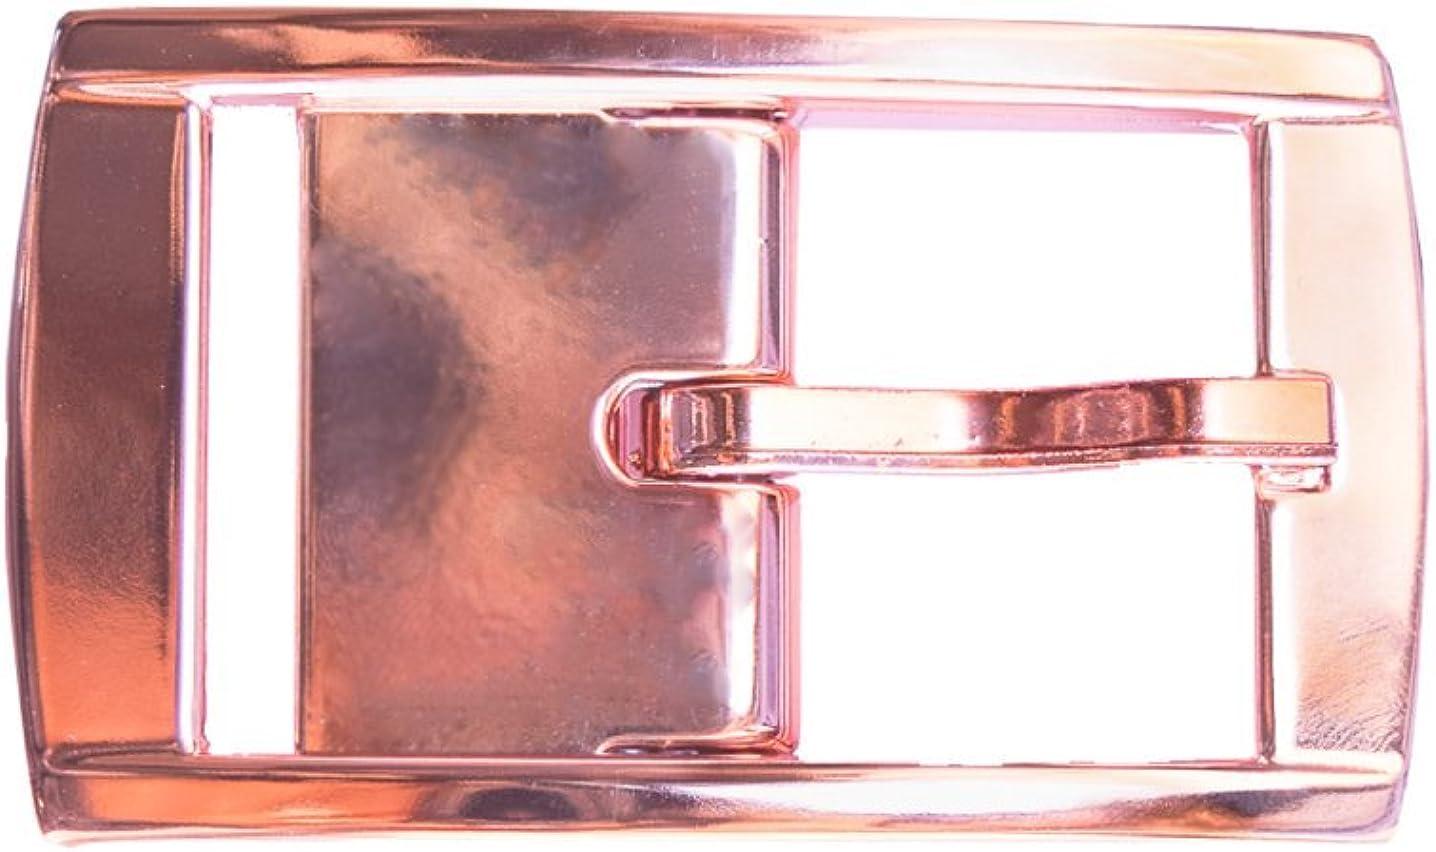 Interchangeable Belt Buckle for C4 Classic Belts